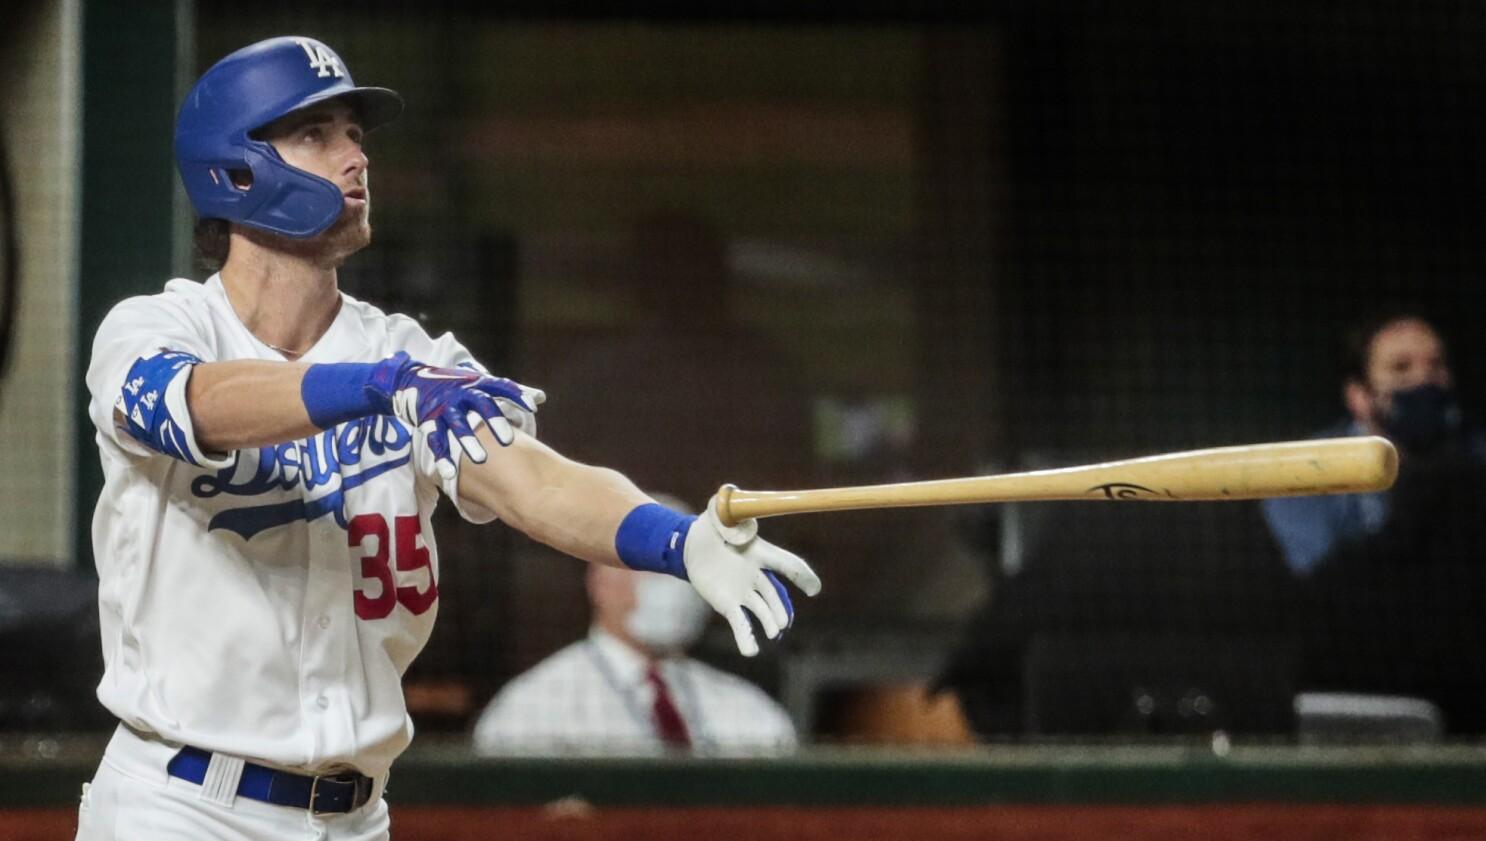 Dodgers' star Cody Bellinger tossing his bat.